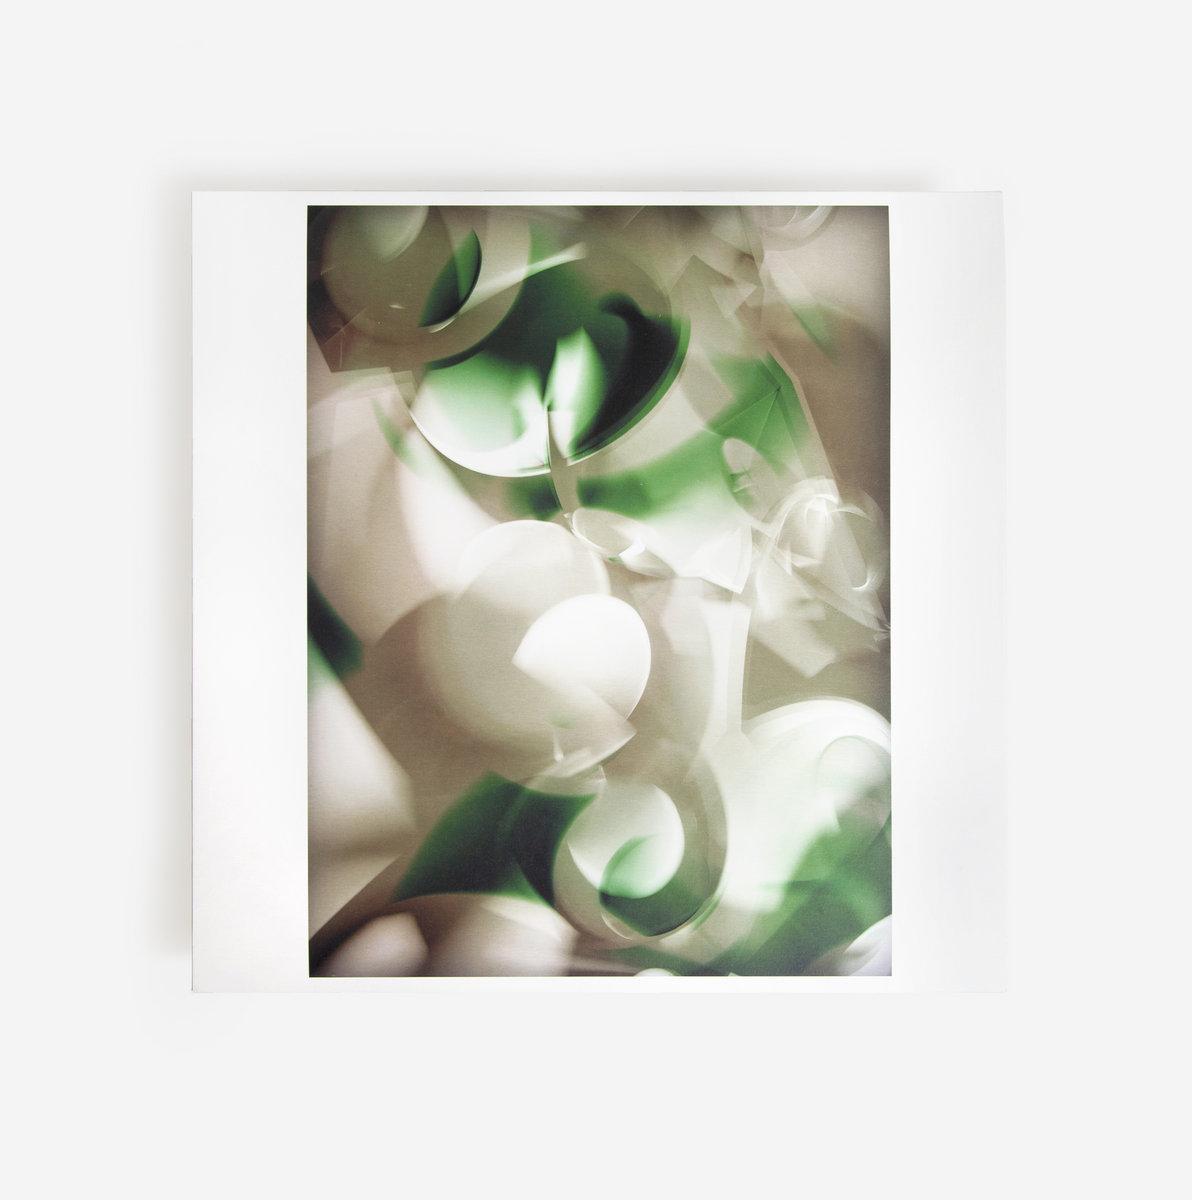 BEATRICE DILLON - Workaround : LP gallery 1